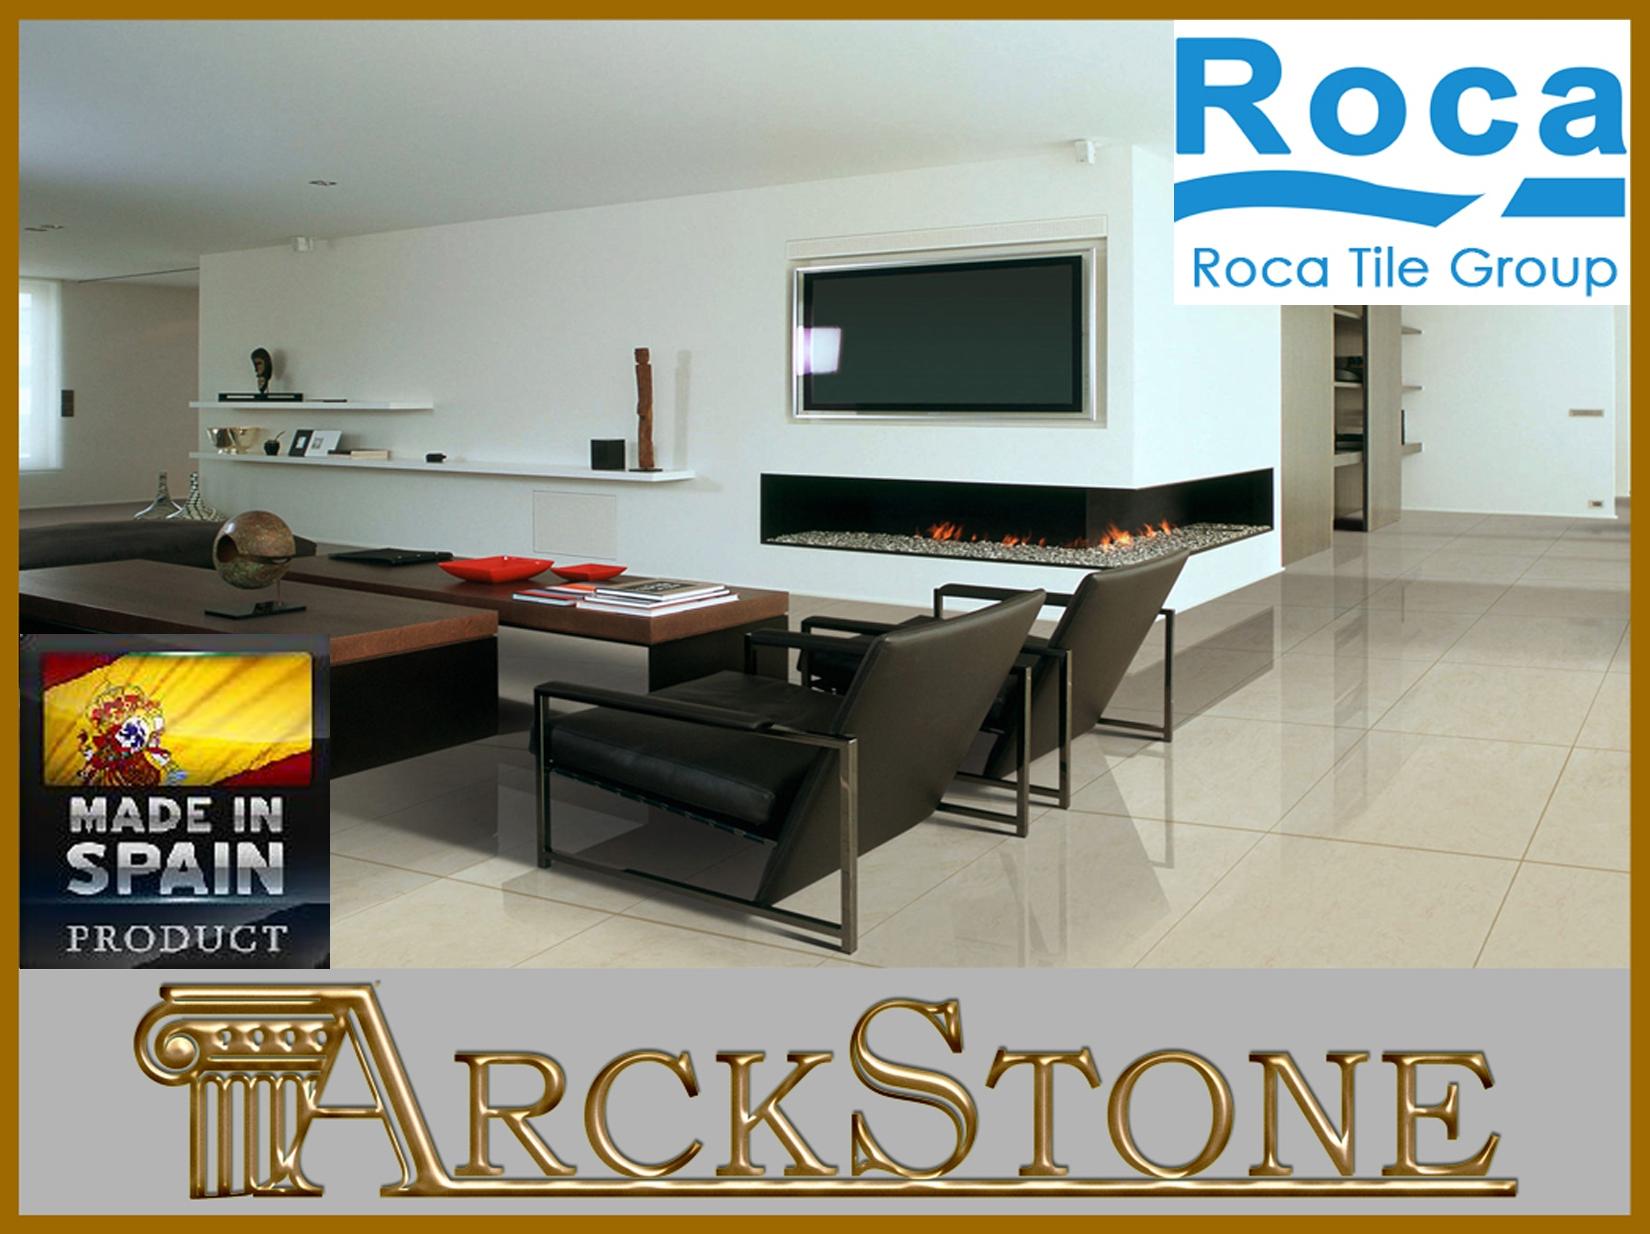 Arckstone pavimento piastrella cucina bagno gres lucido casa roca stratos beige ebay - Roca piastrelle bagno ...